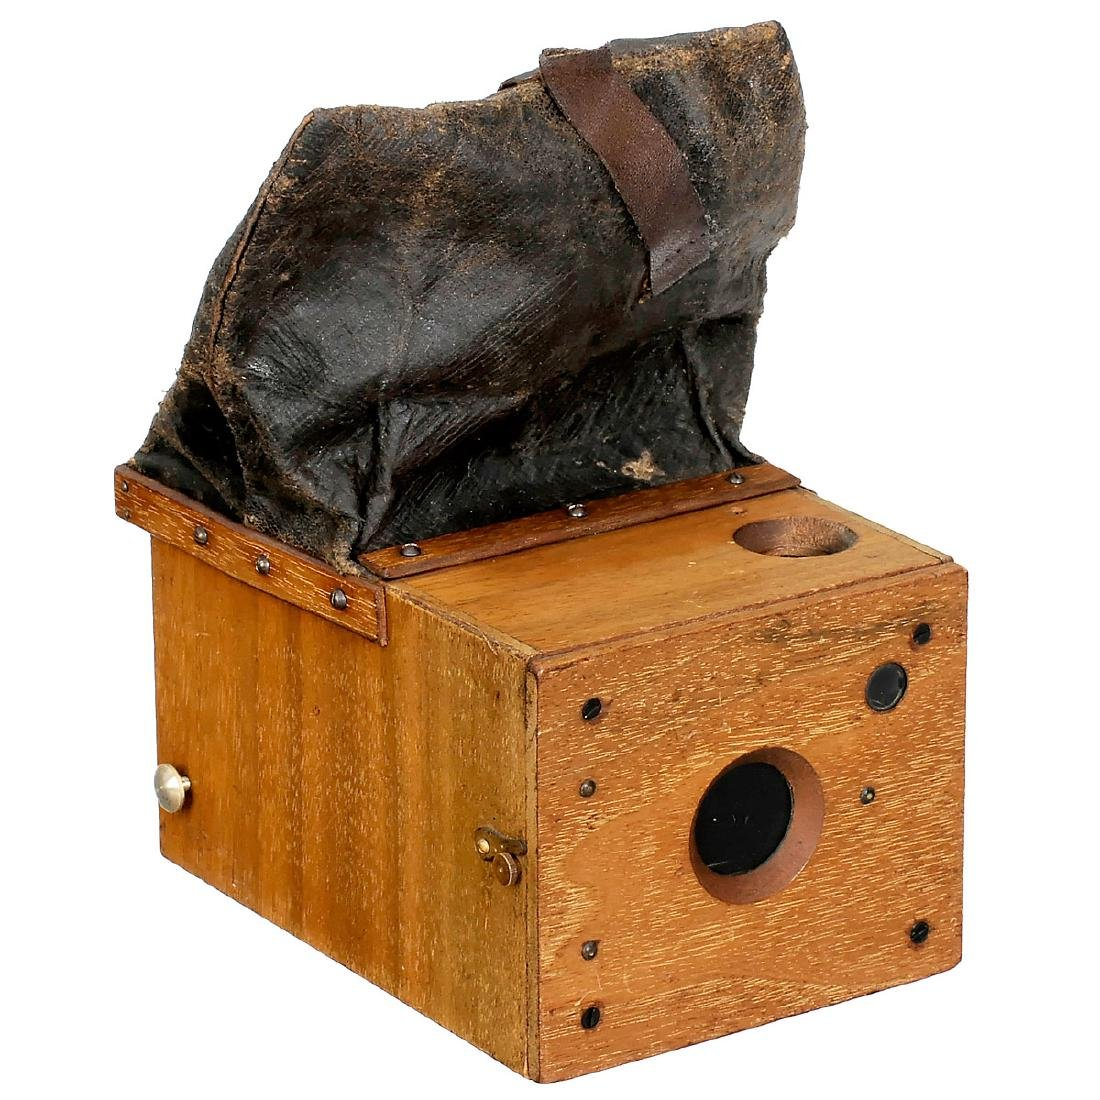 Detective Magazine Camera 6 x 8 cm by Stirn, c. 1891